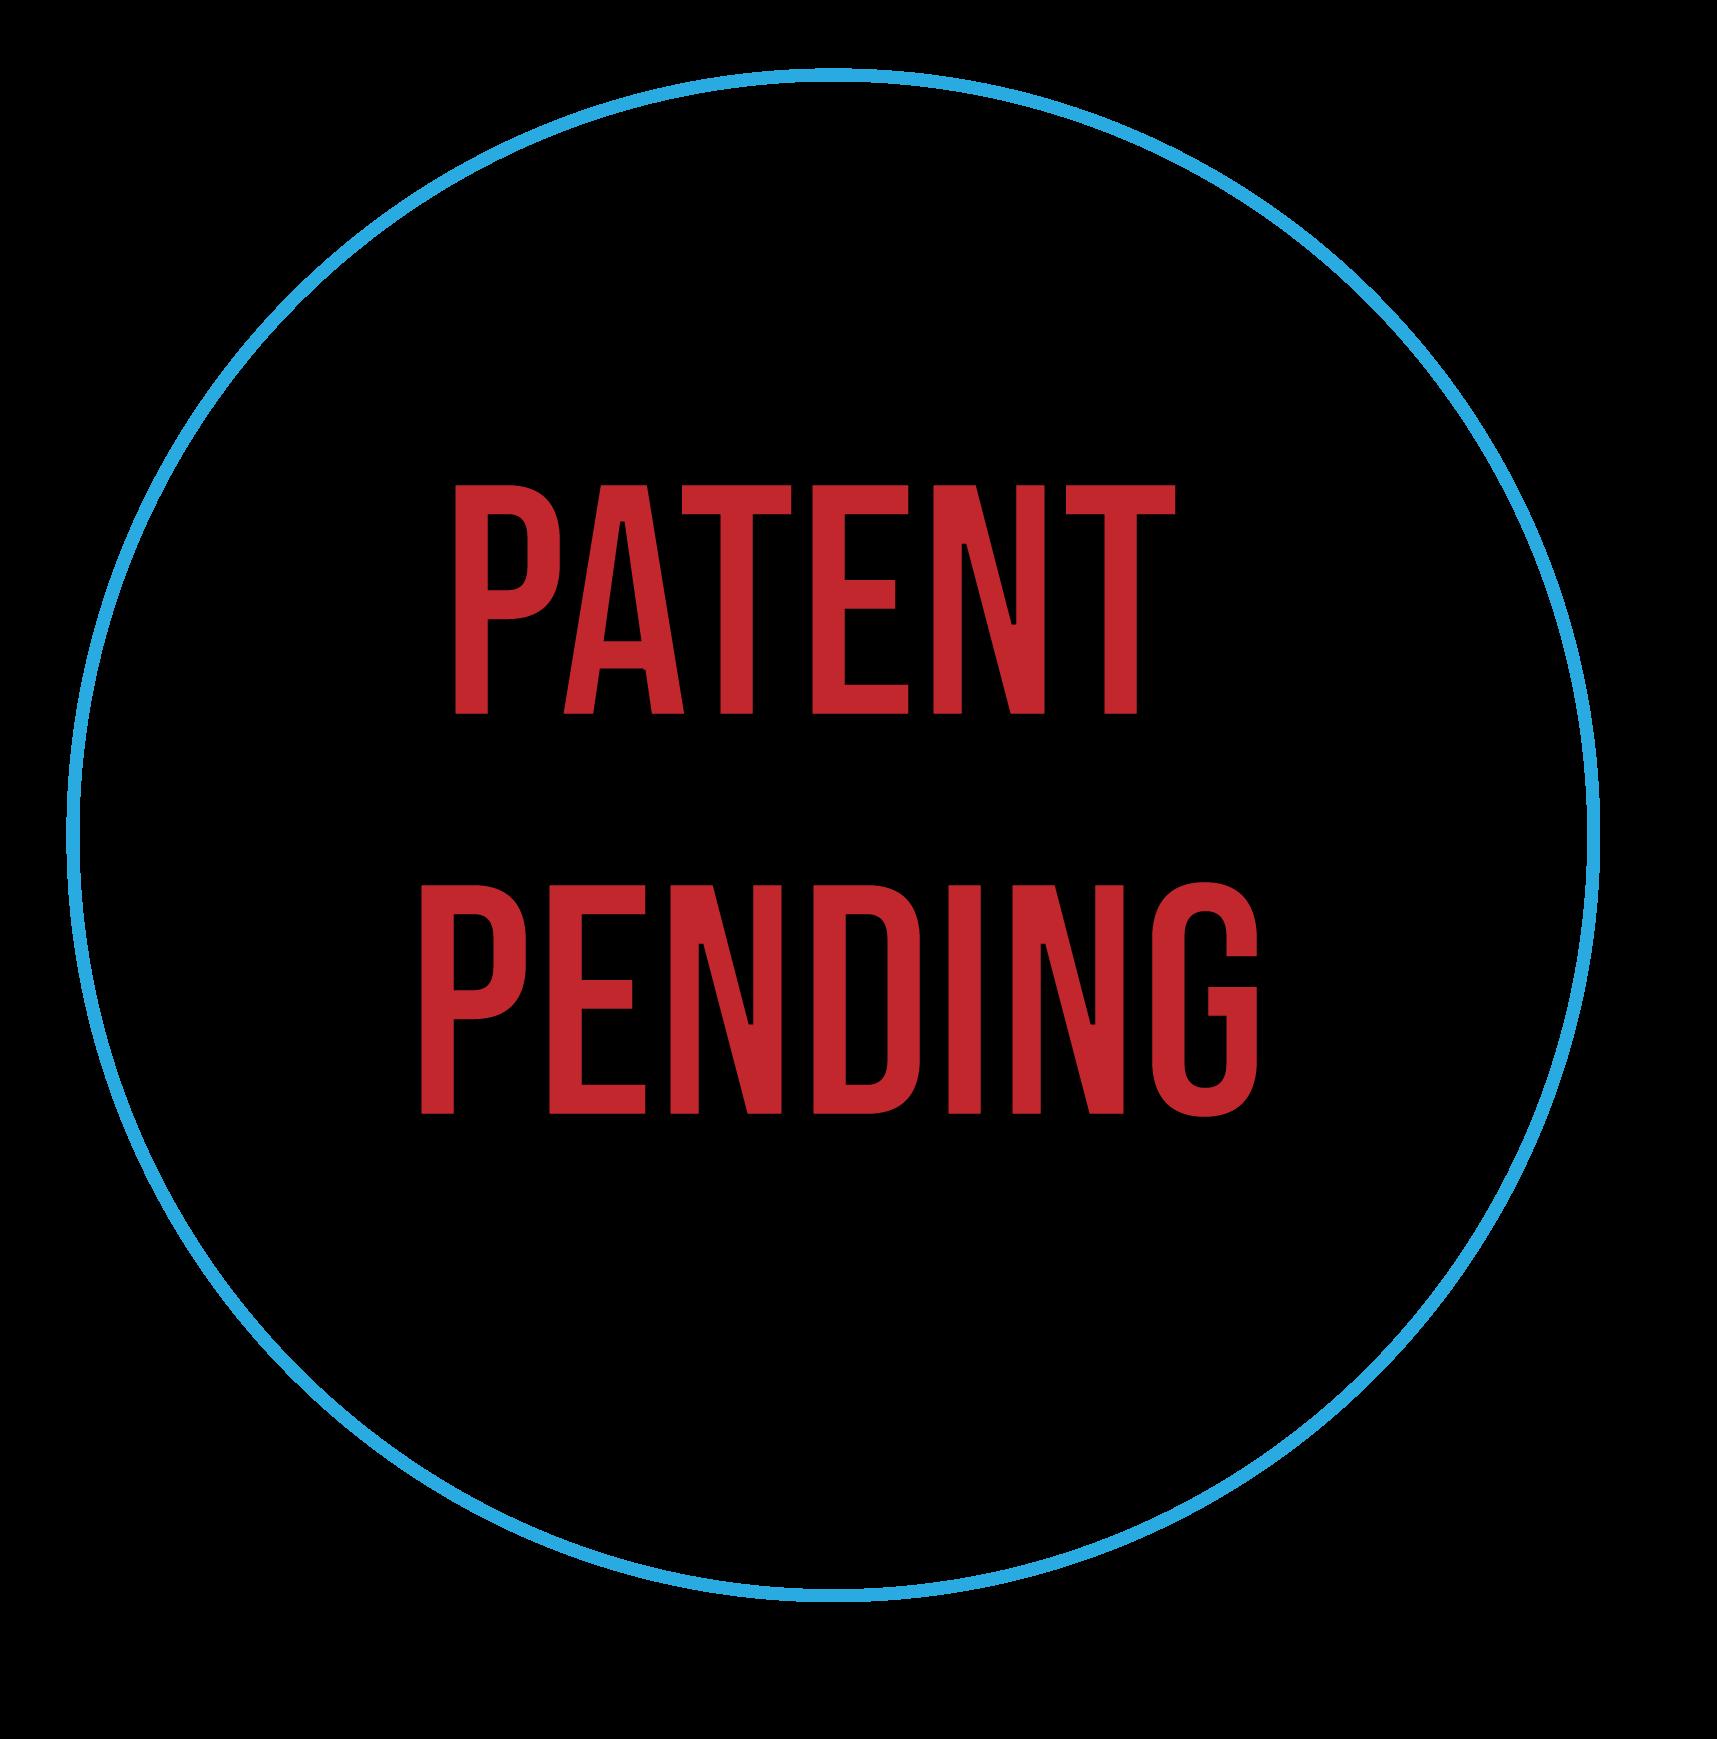 Patent Pending Stamp